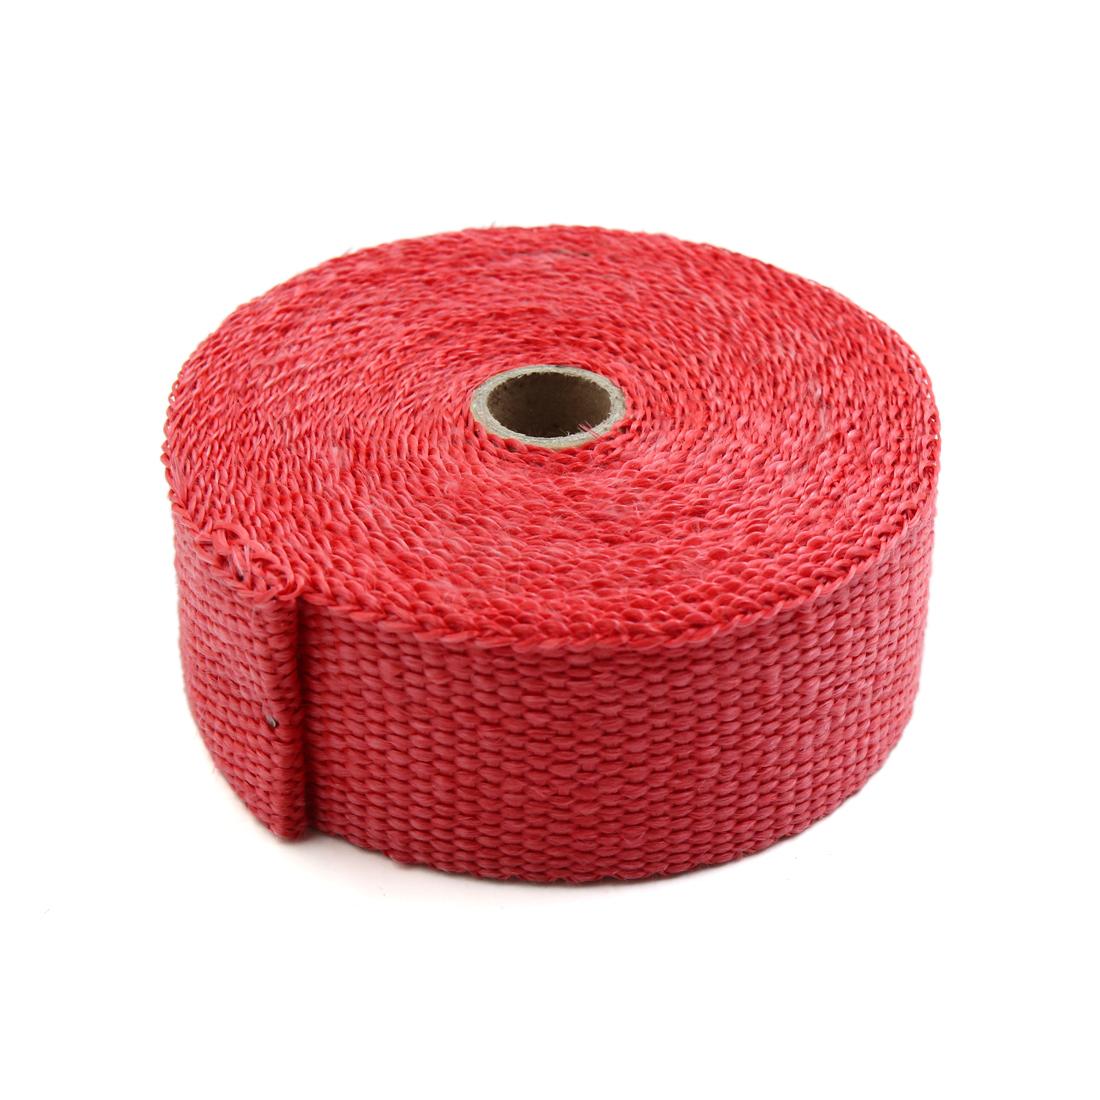 Red 10M Length Fiberglass Cloth Car Exhaust Pipe Heat Insulation Wrap Tape - image 2 de 2